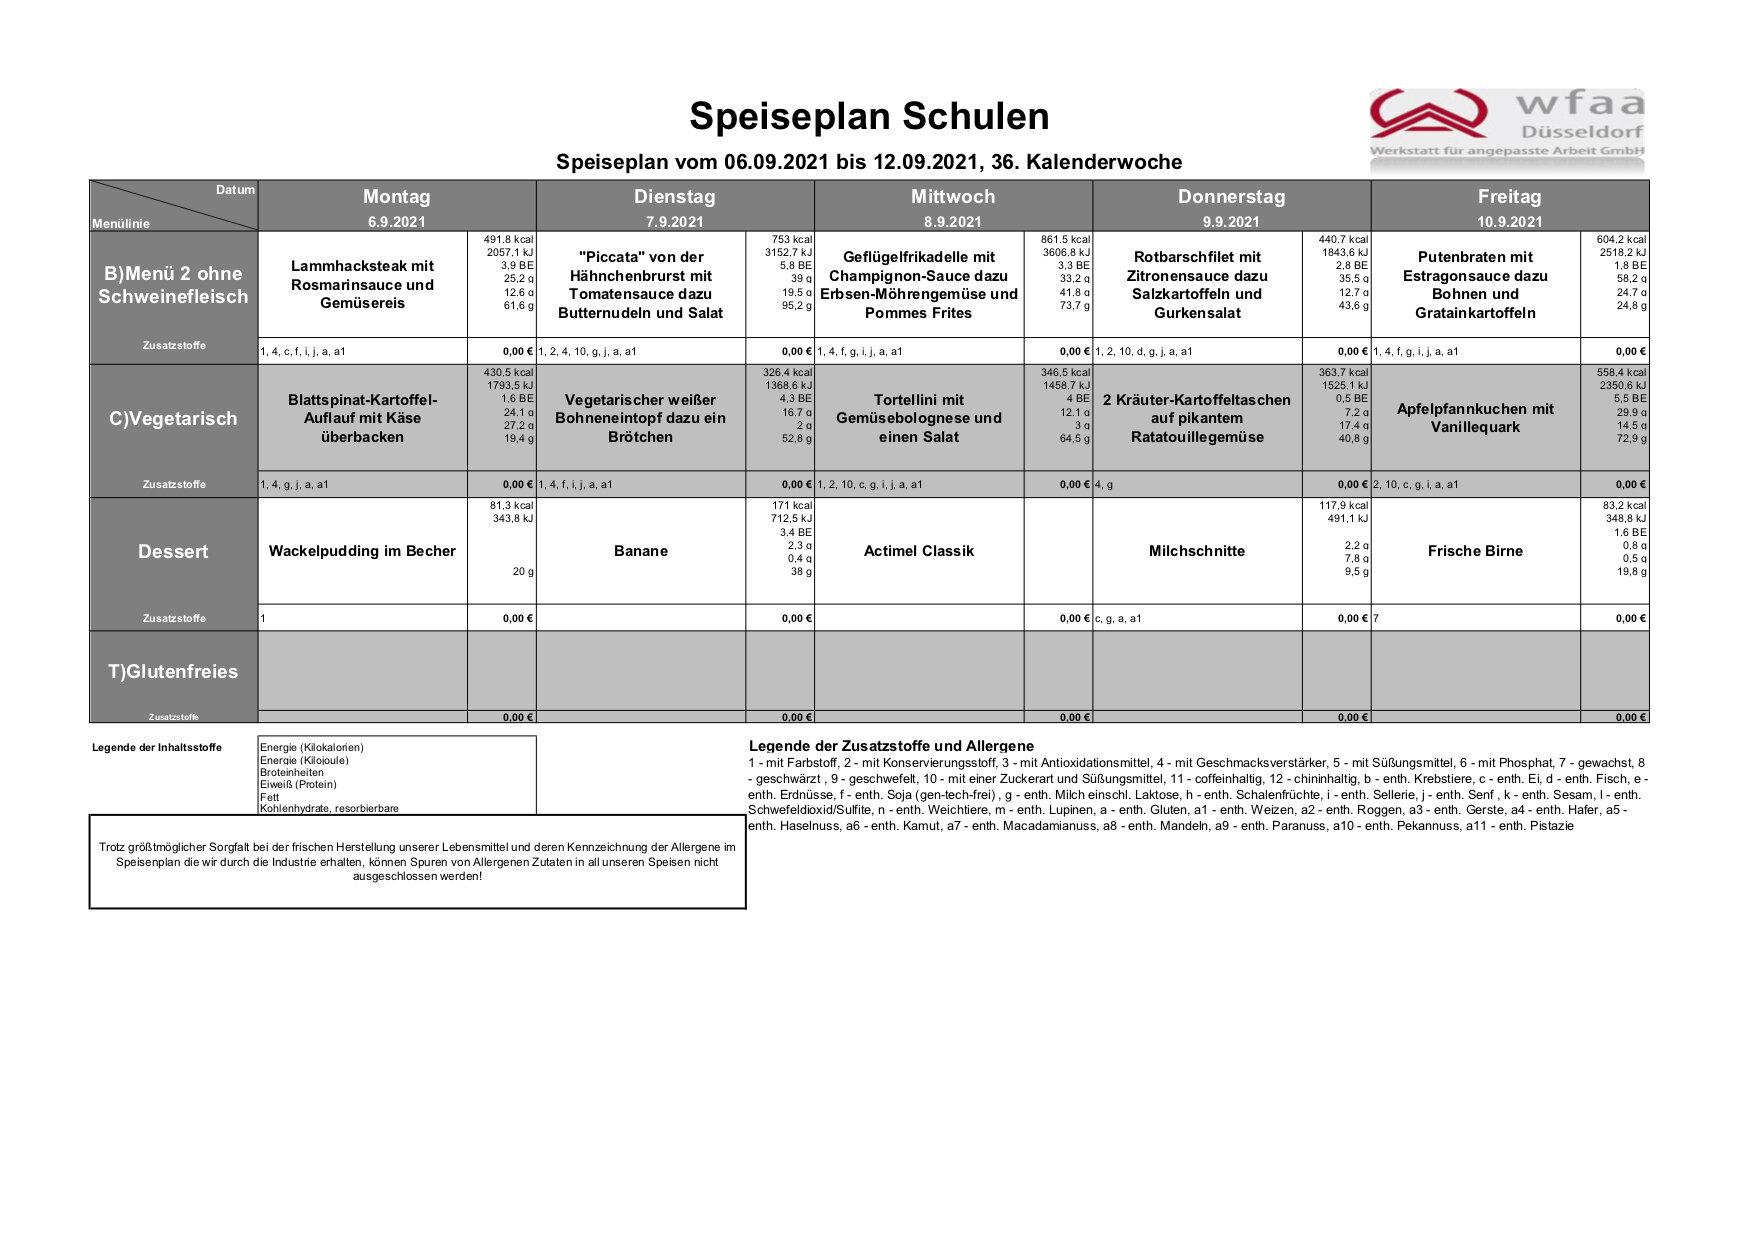 Speiseplan 06. - 12.09.2021 (KW 36)